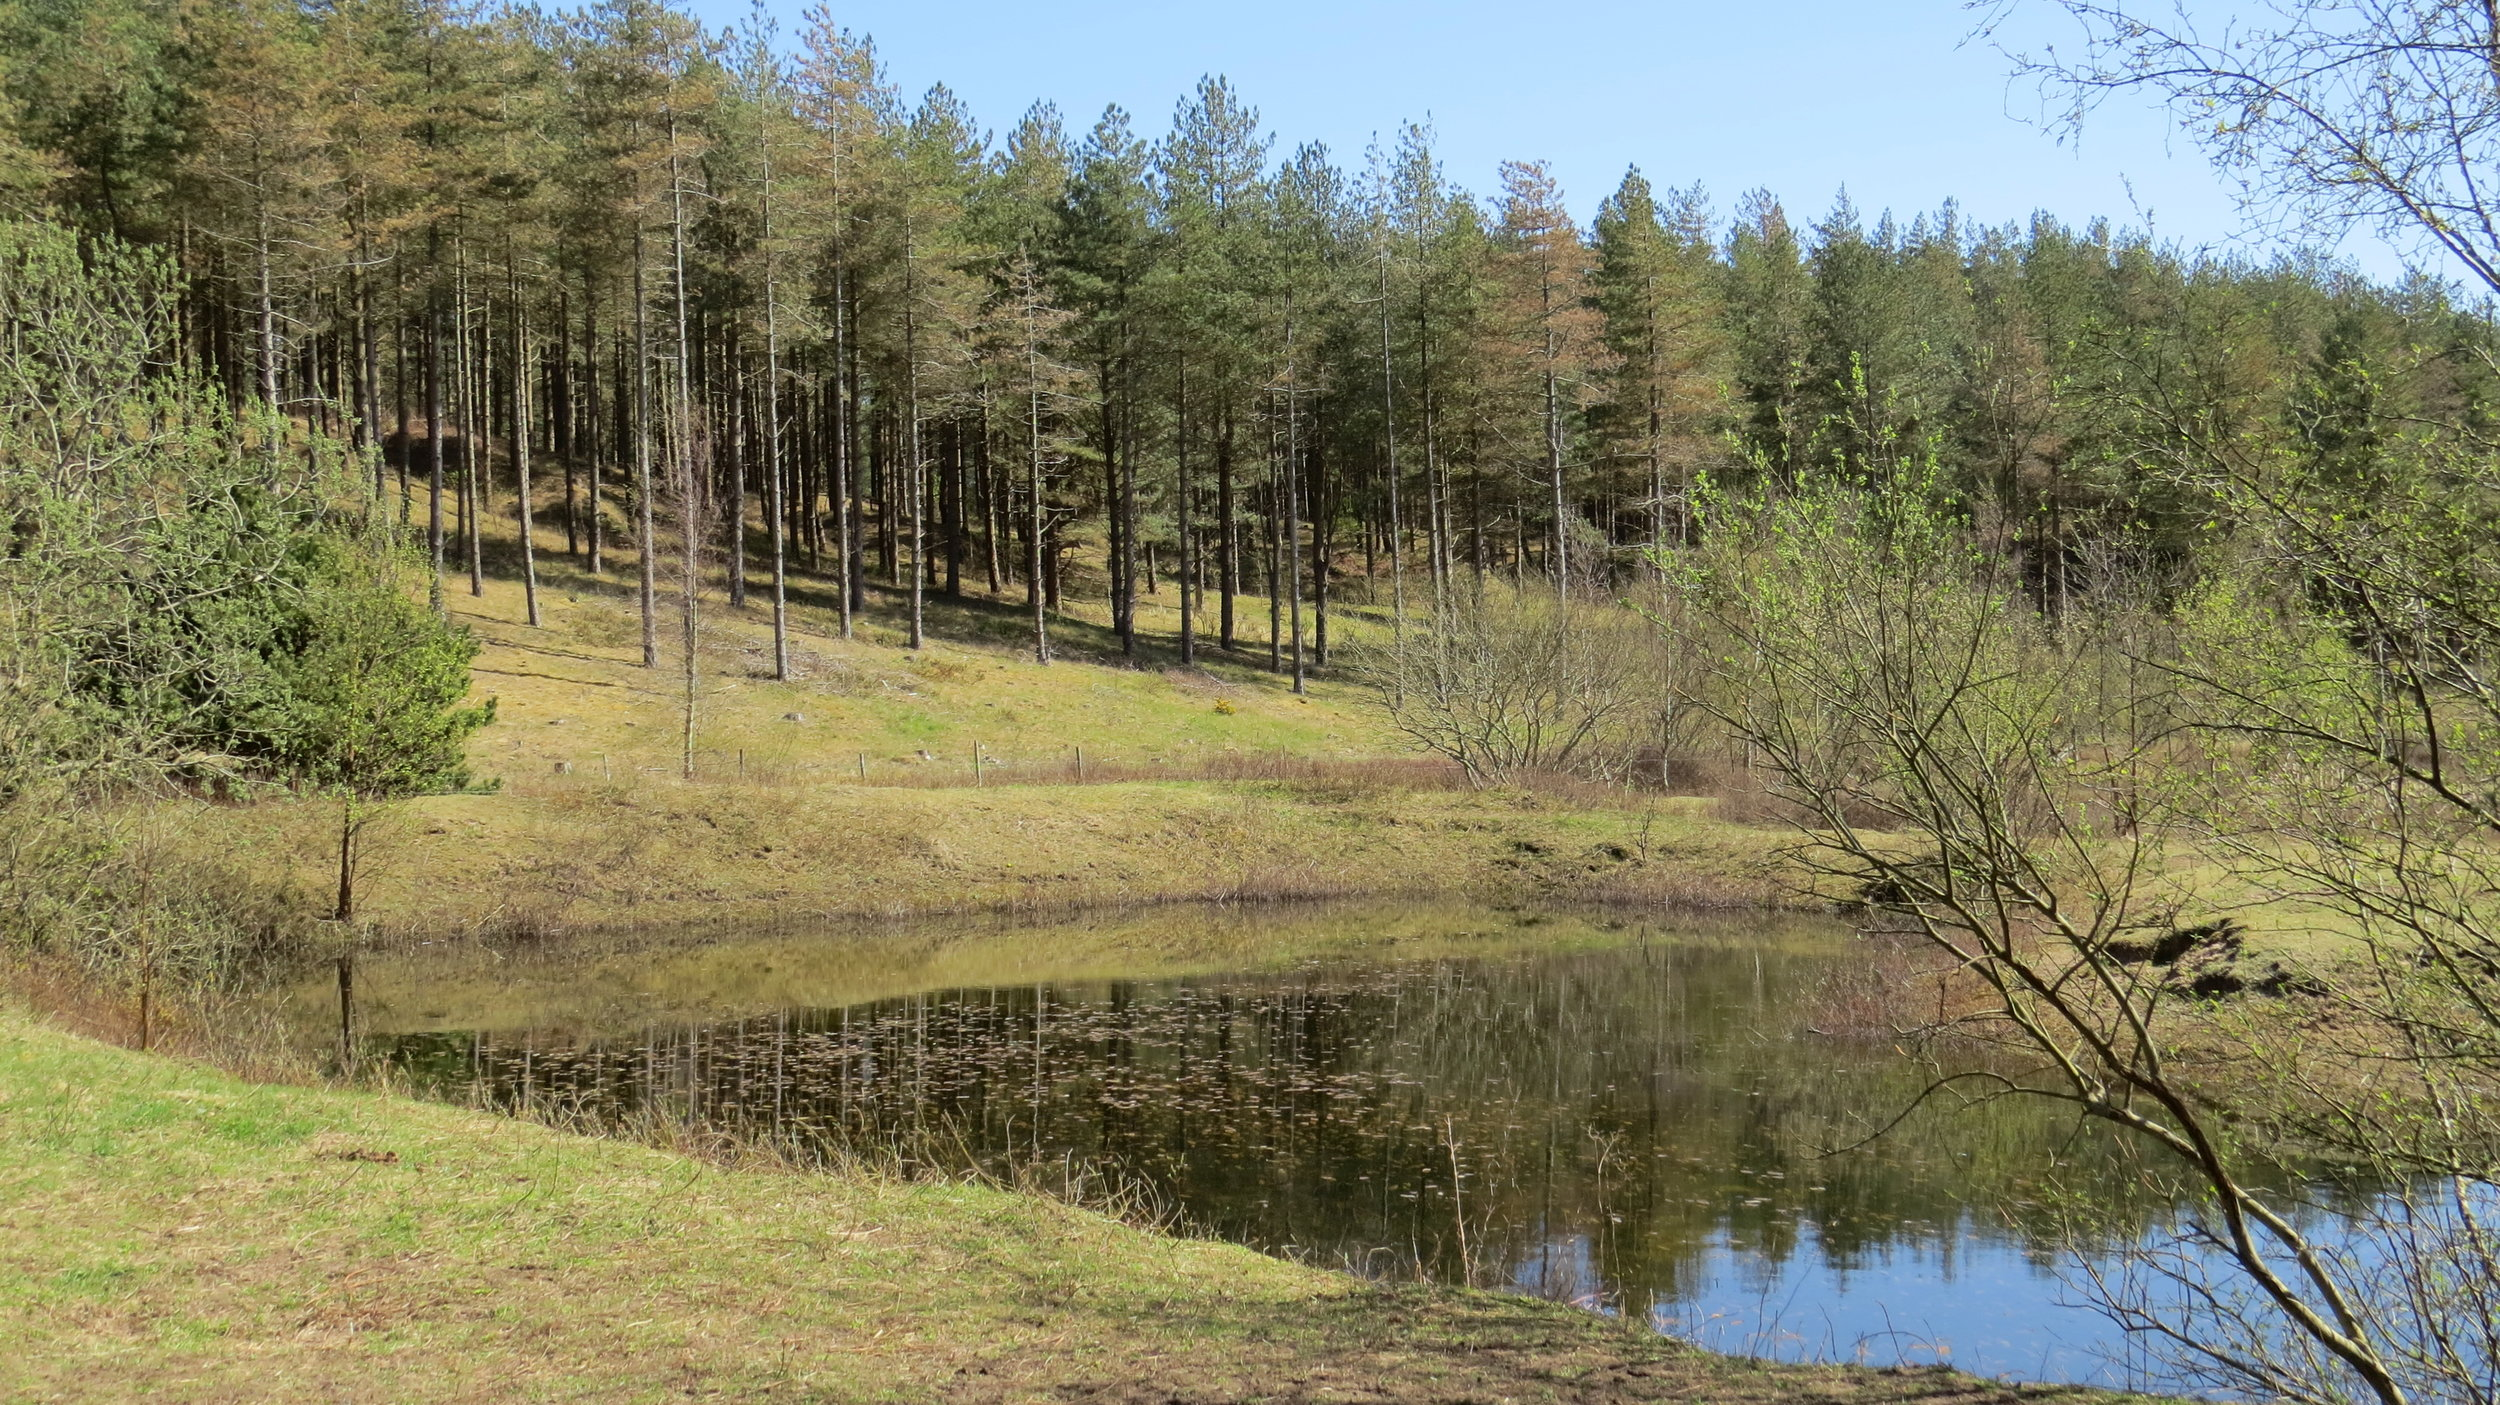 Newborough Forest Reflection